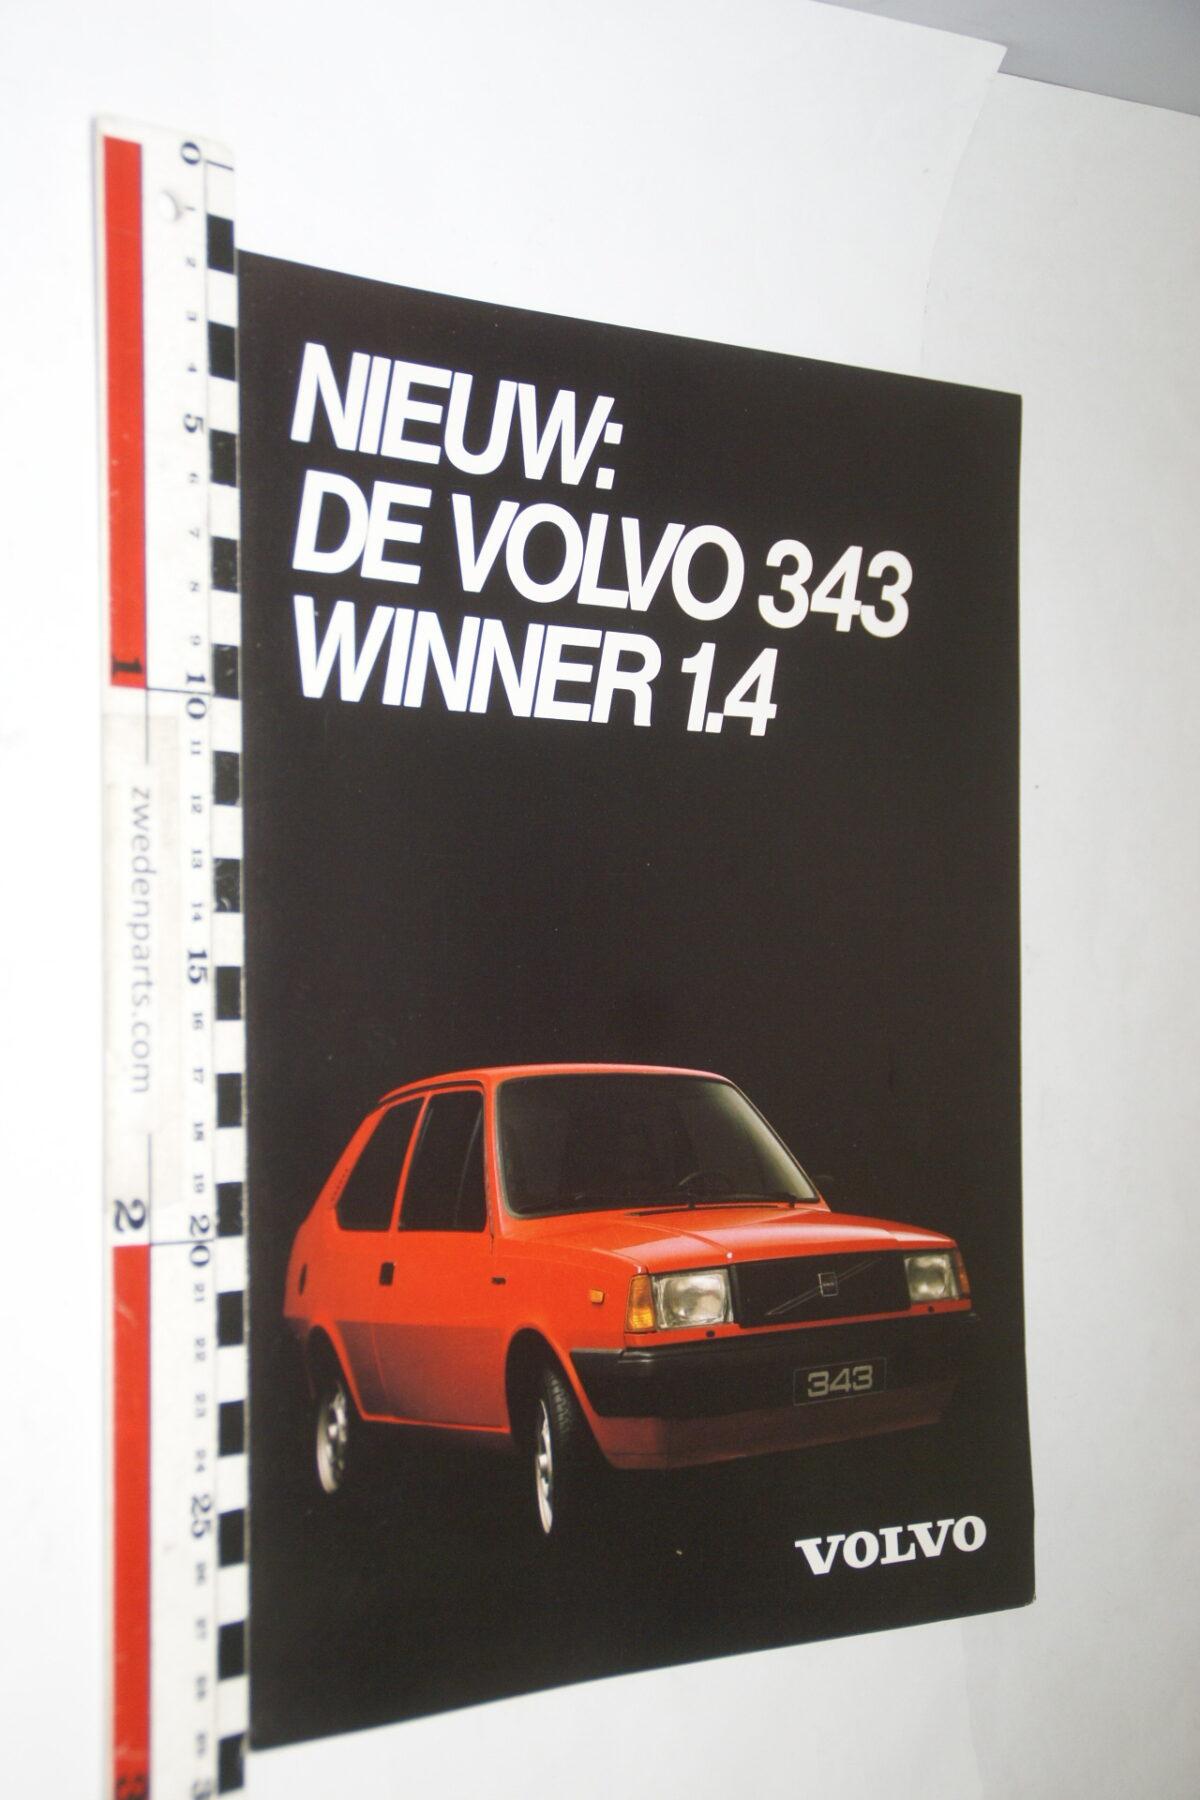 DSC03657 ca. 1978 originele brochure Volvo 343 Winner 1.4-0bf72155